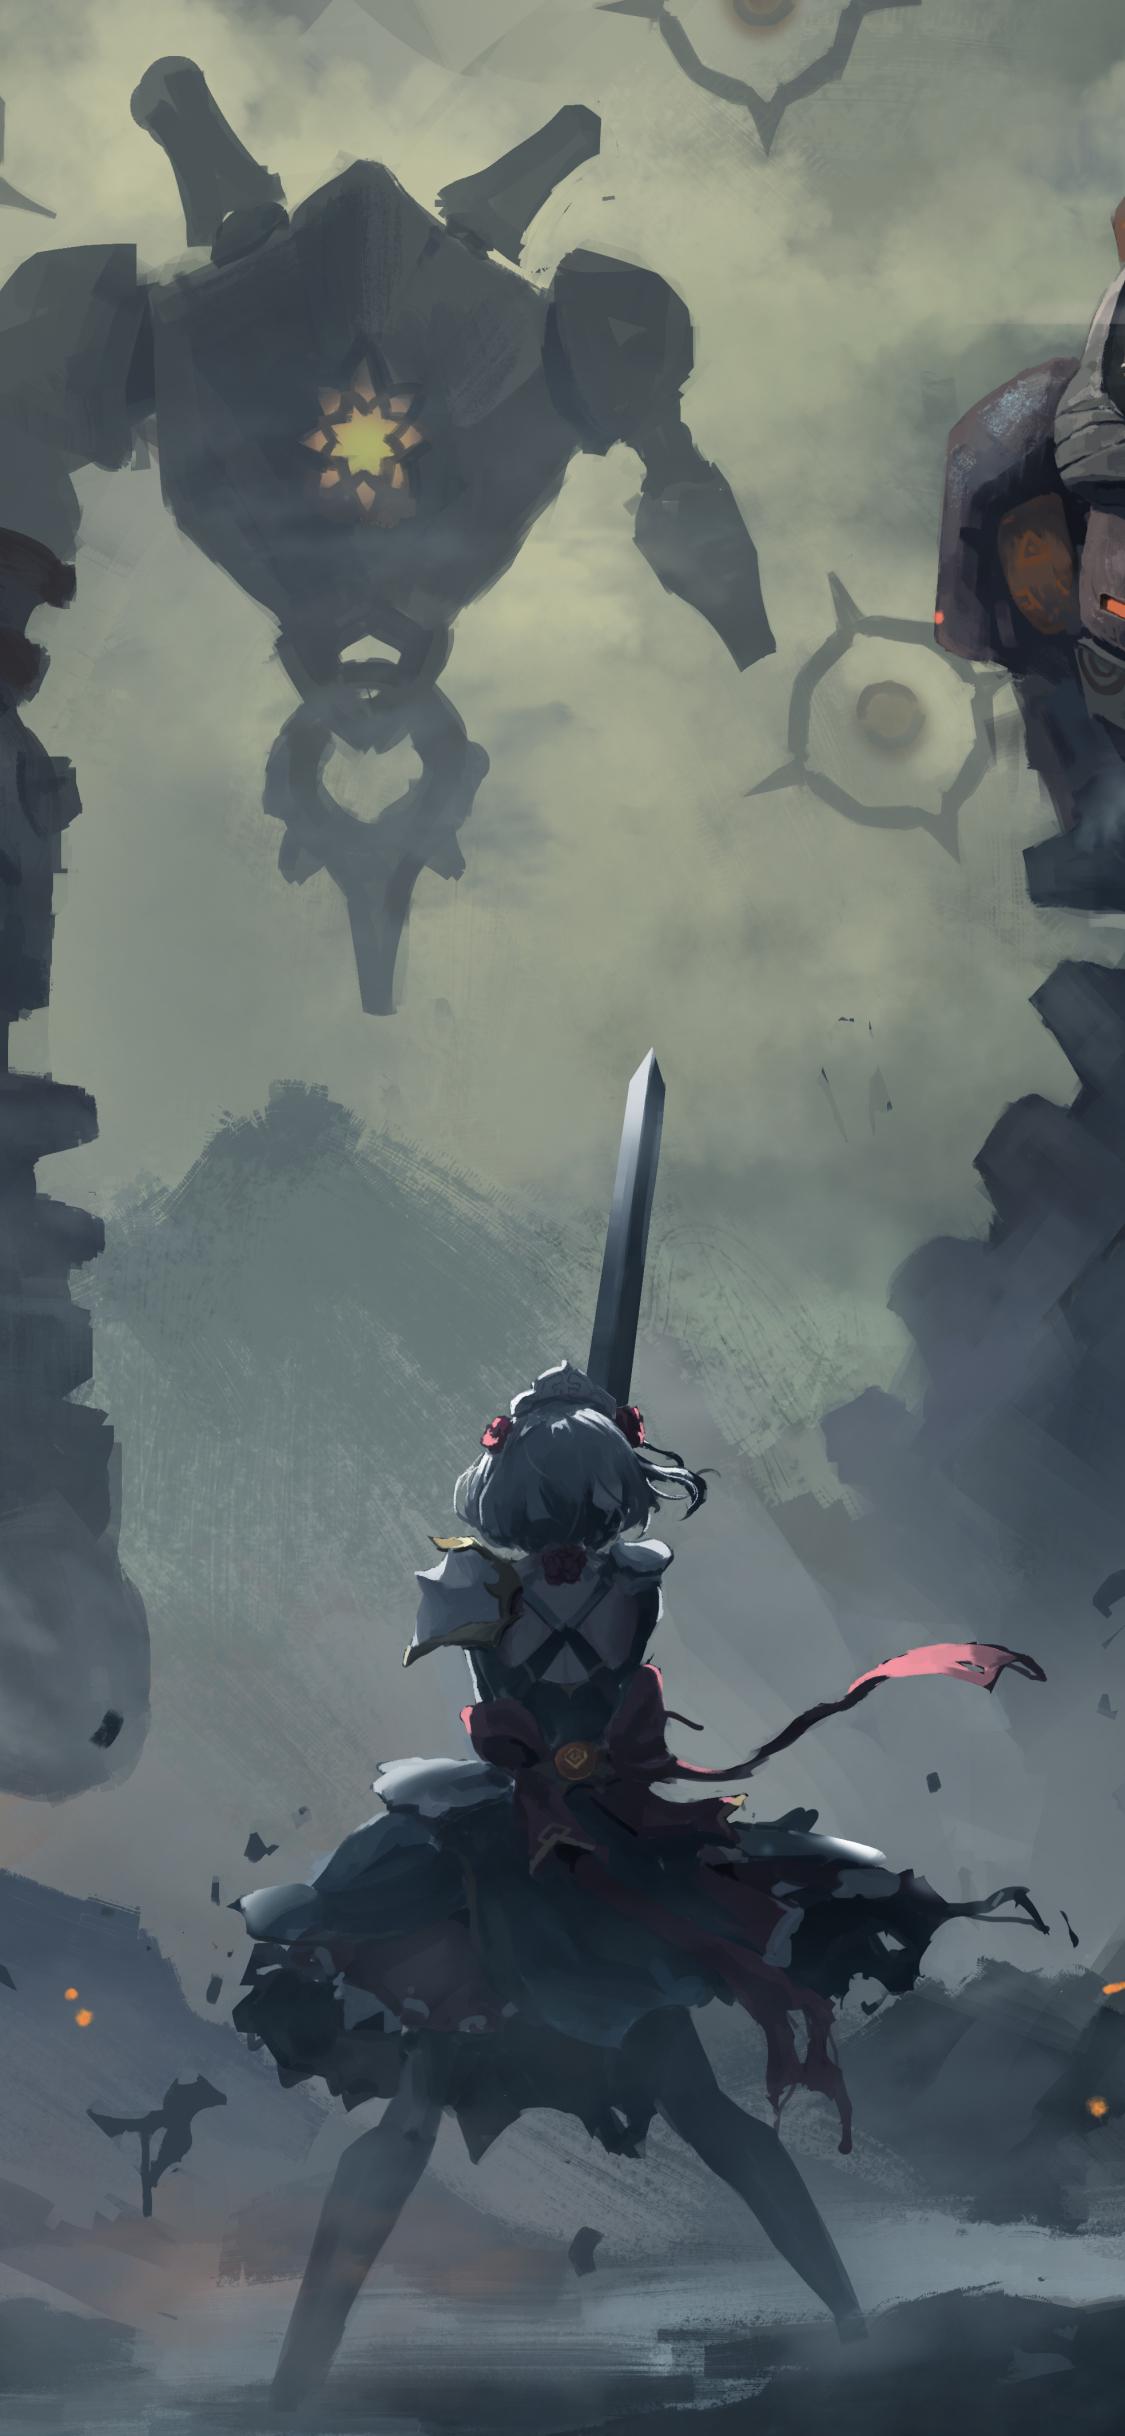 Genshin Impact Game mobile wallpaper